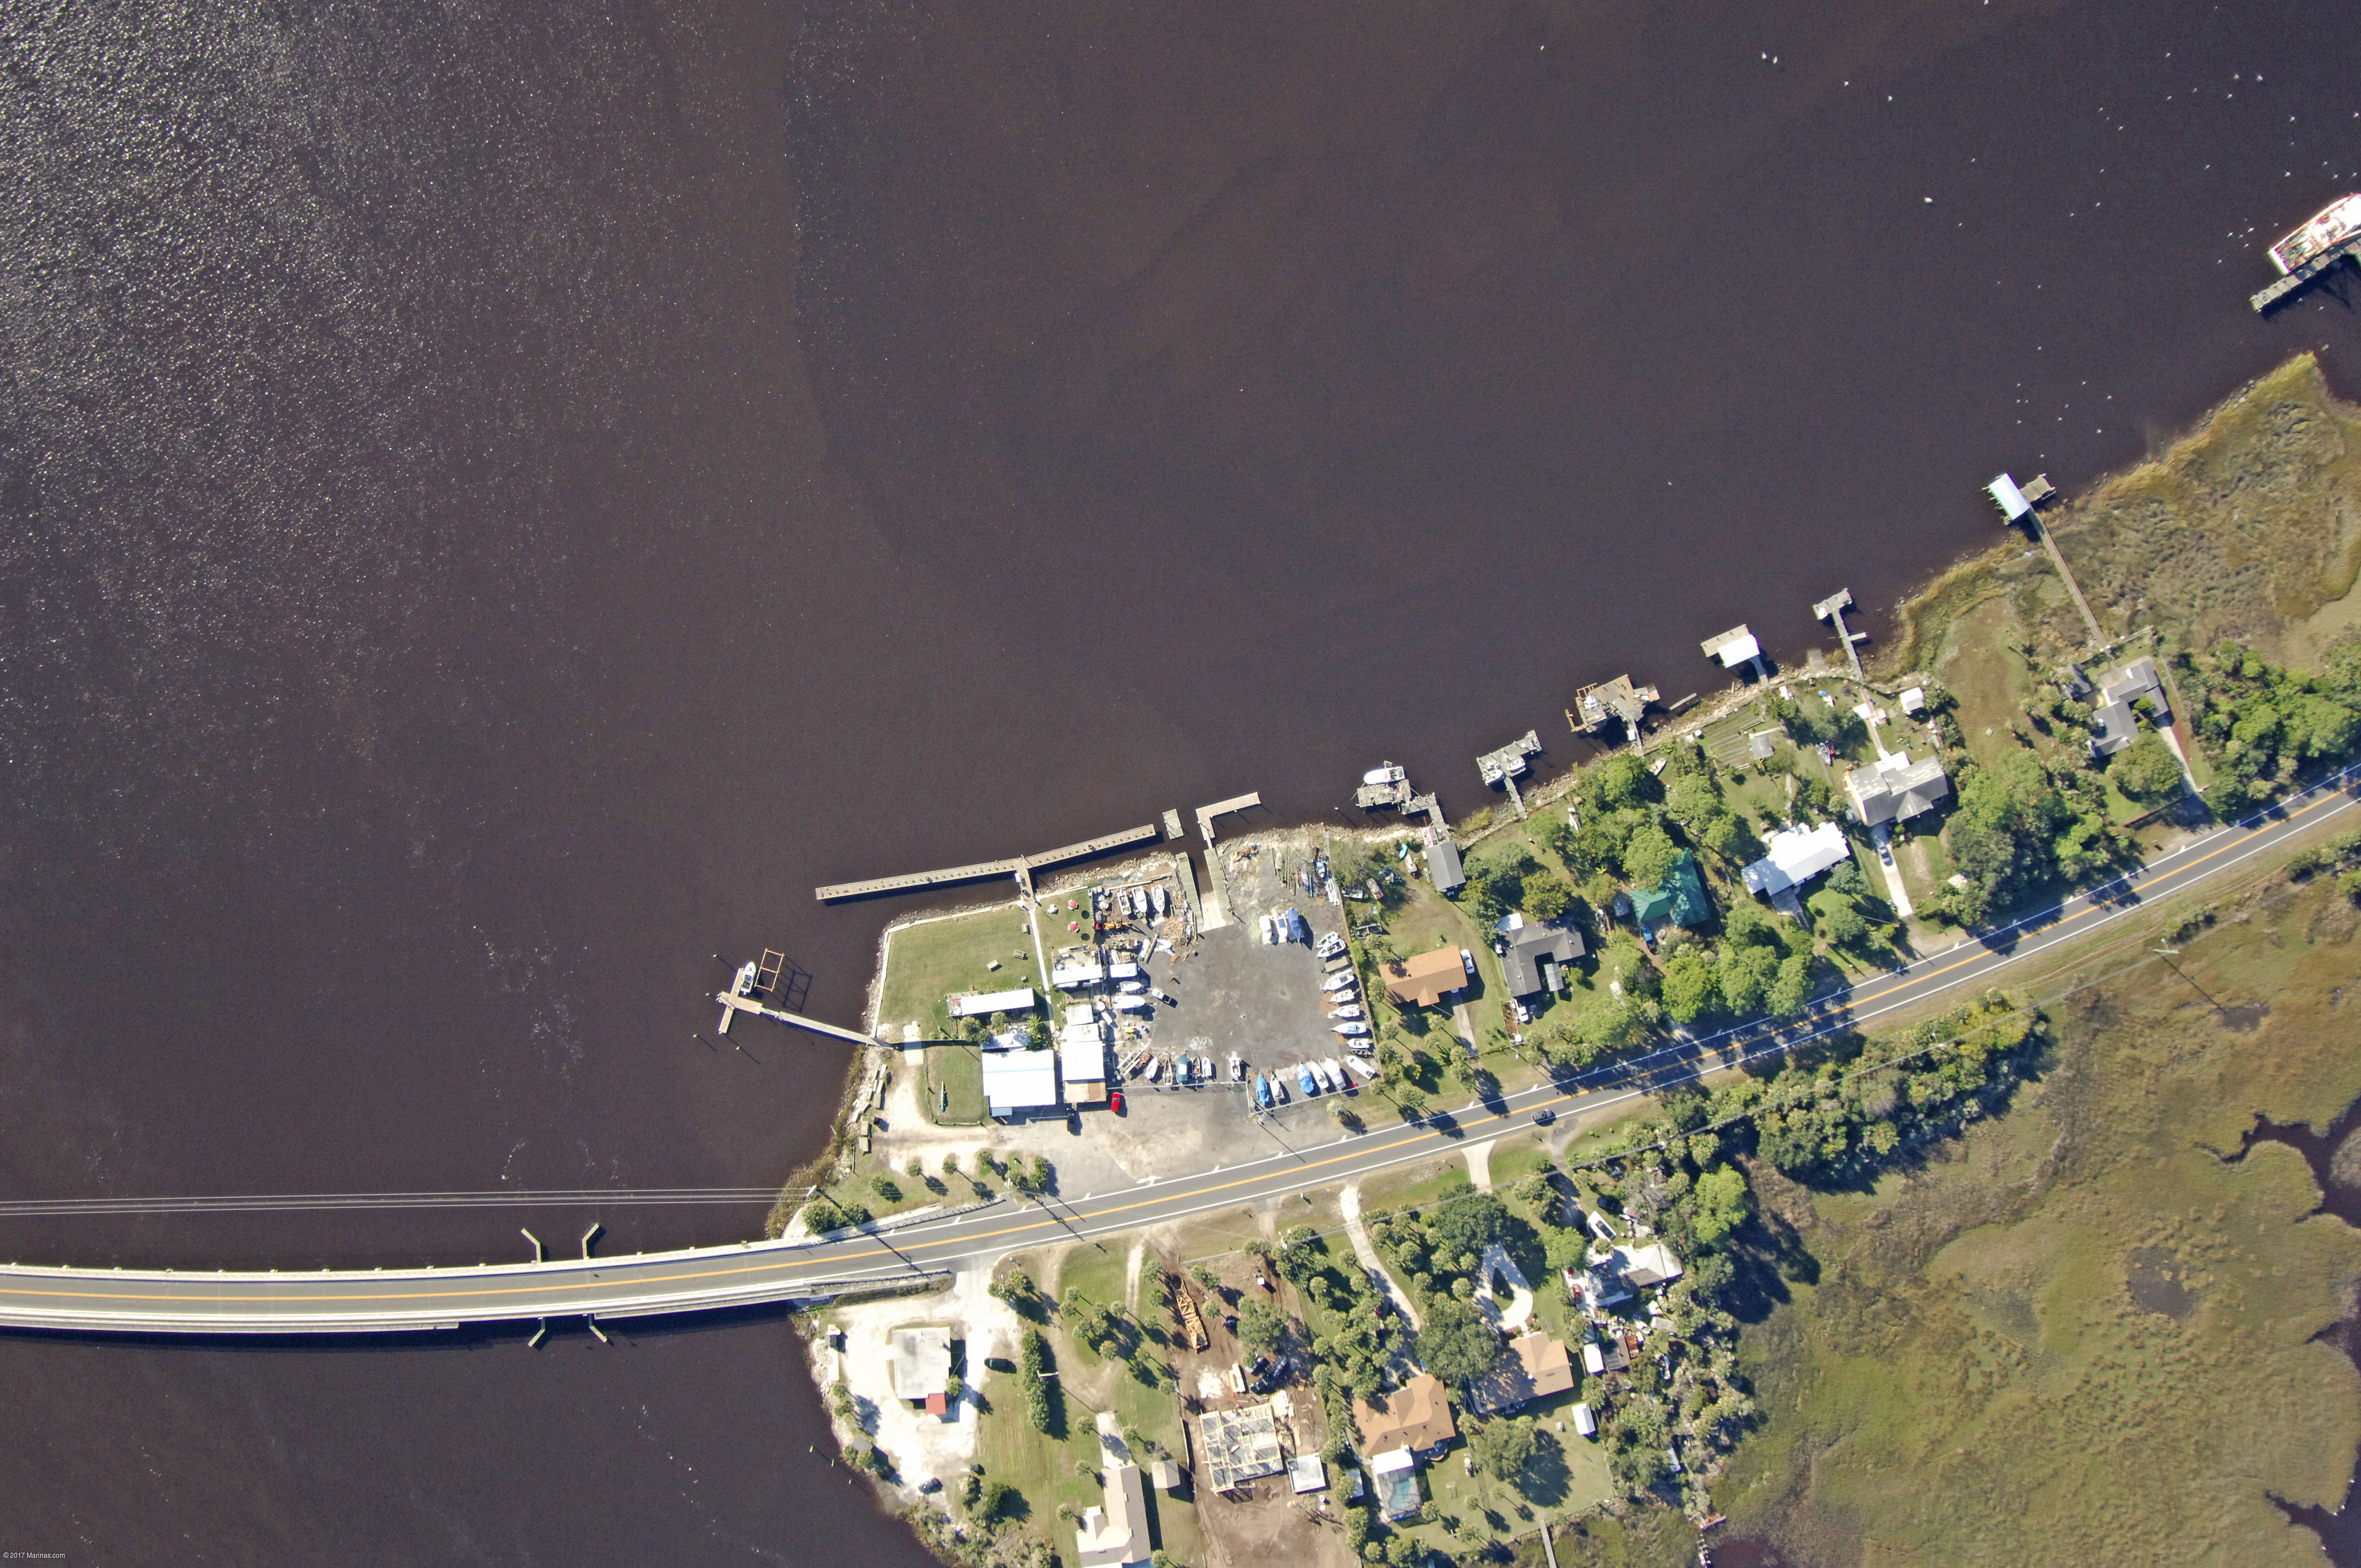 Brown 39 s creek fish camp inc in jacksonville fl united for Fish camp jacksonville